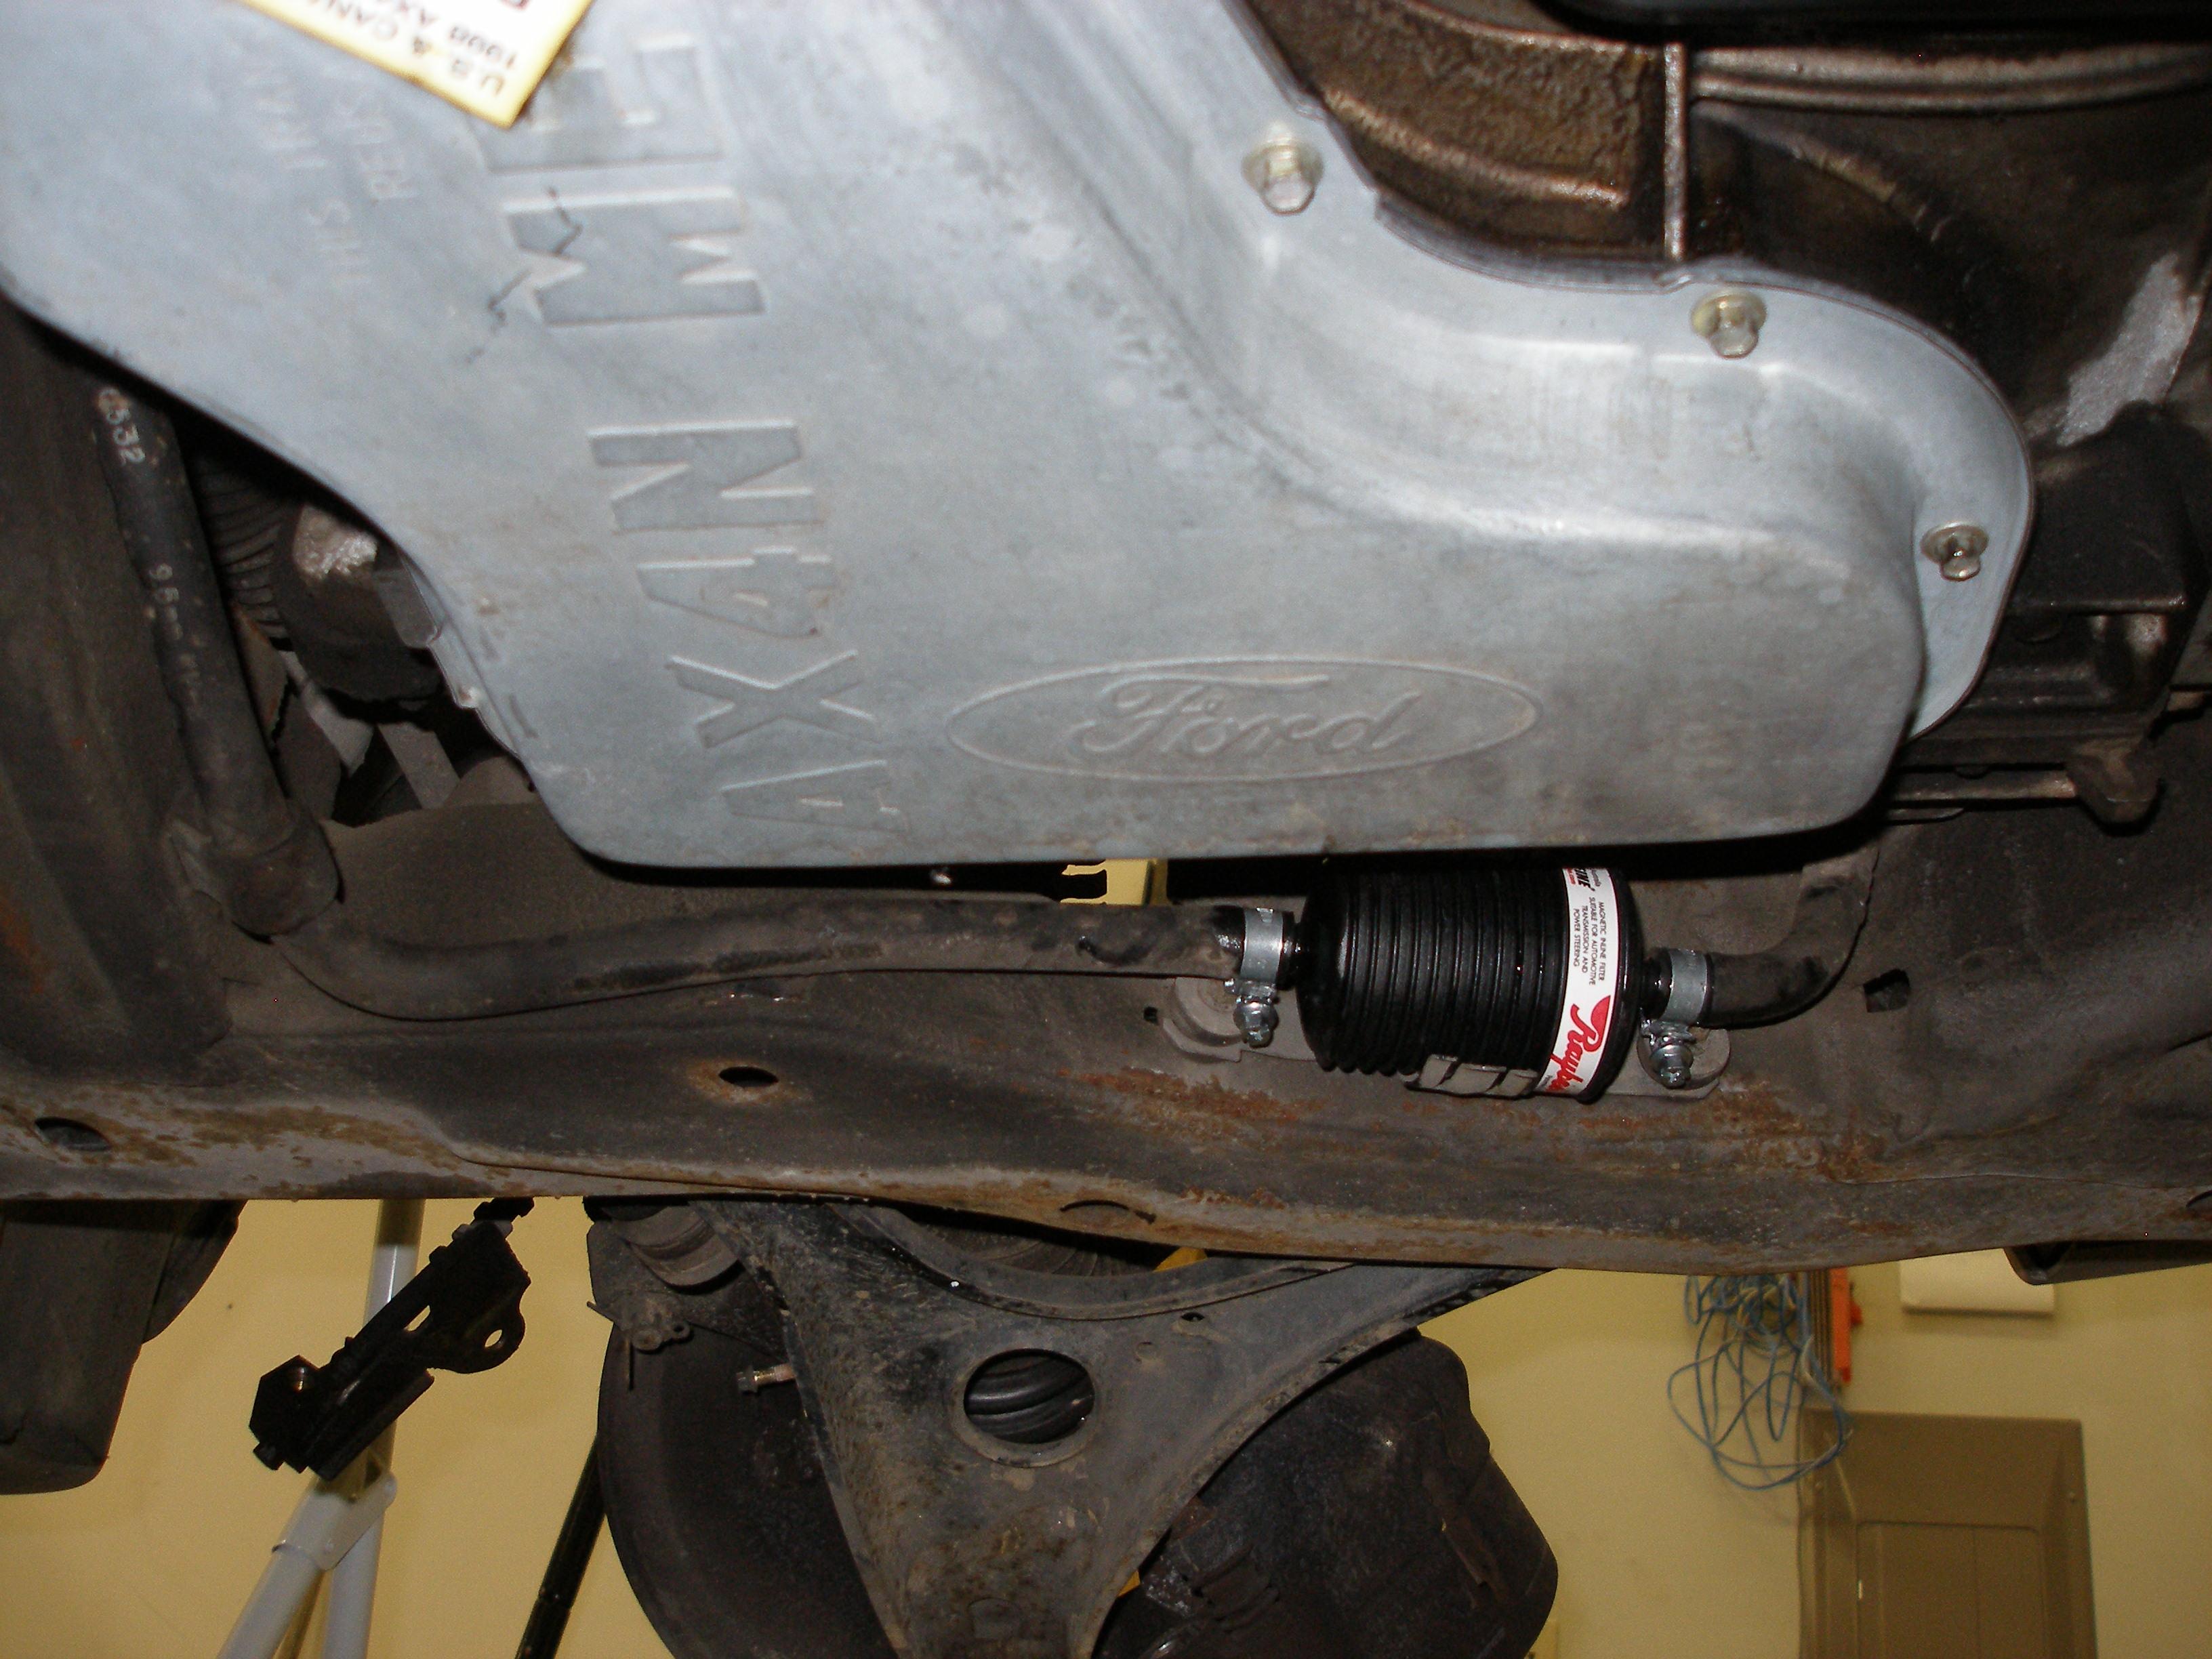 Power steering fluid filter page 2 taurus car club of america ford taurus forum